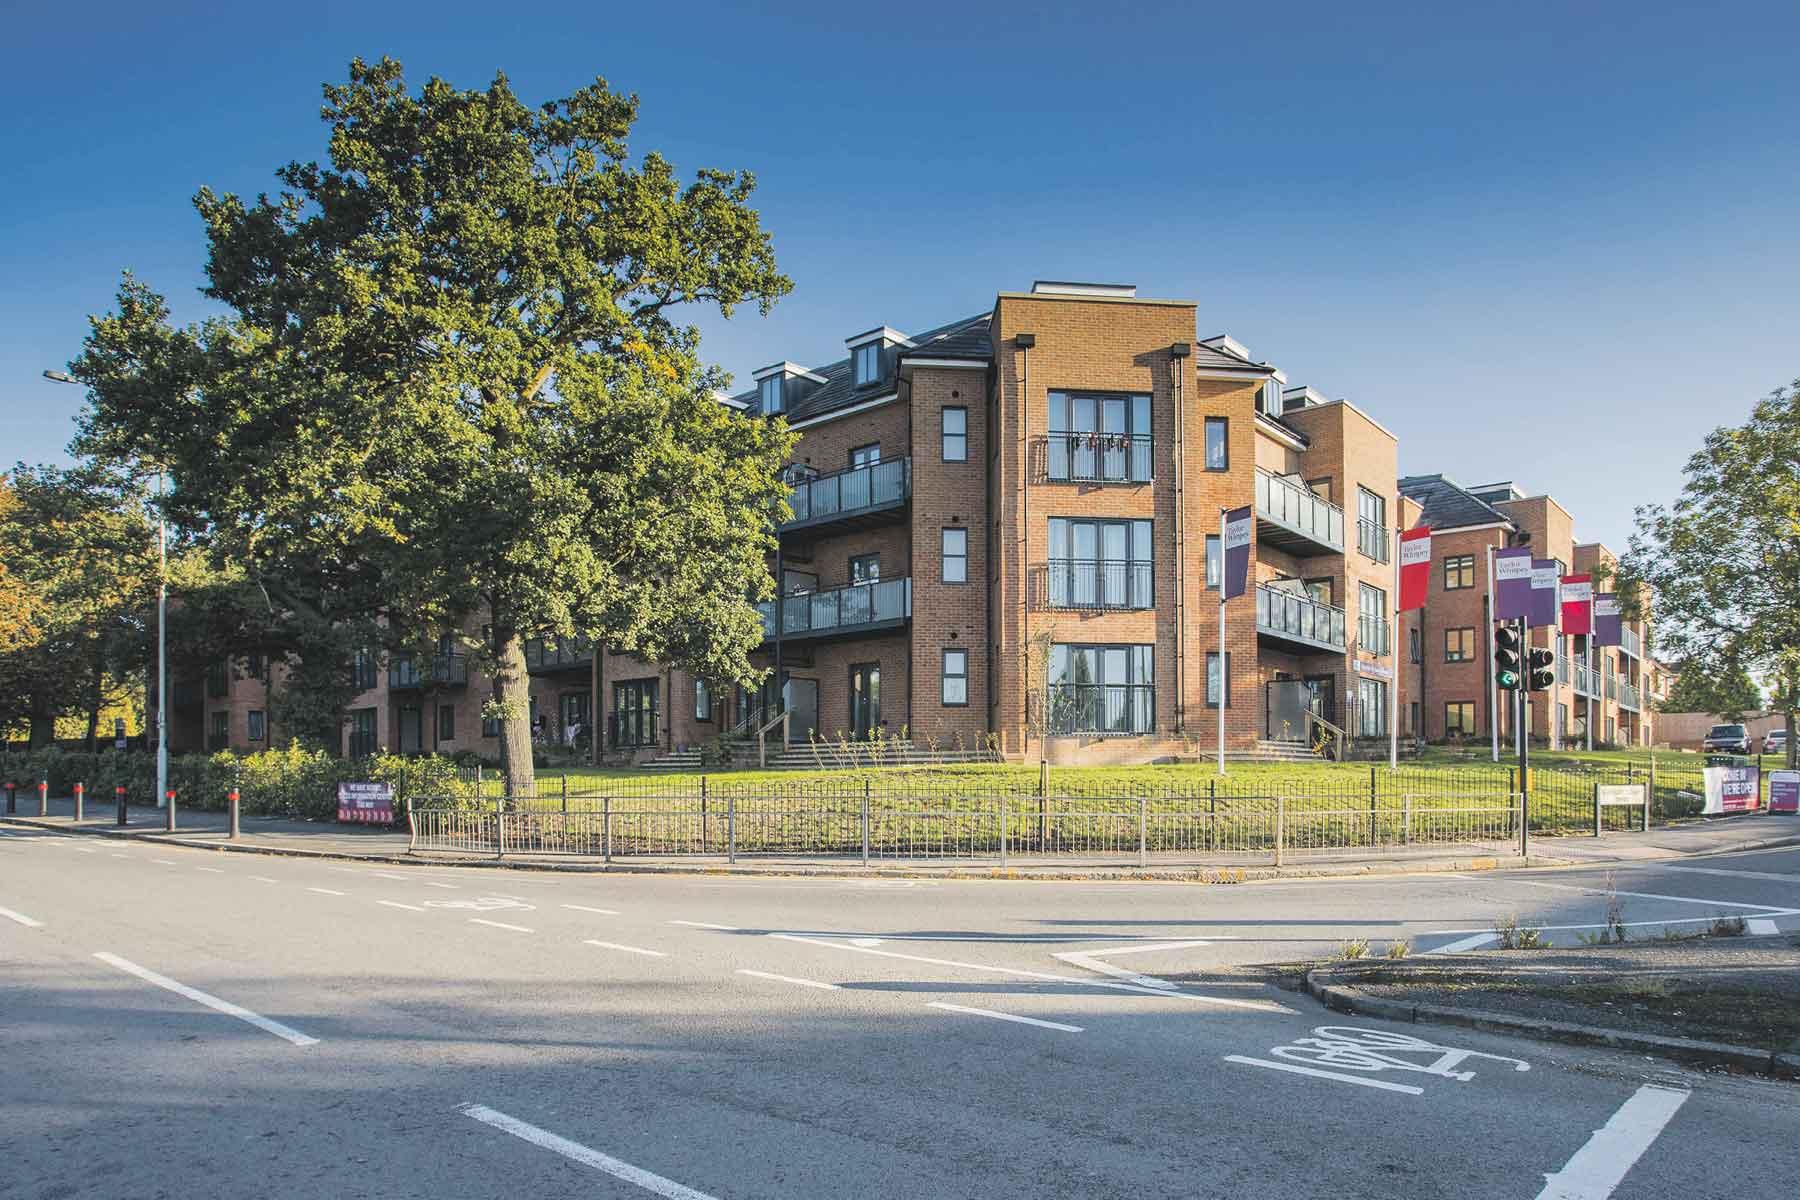 St George's Square - New Homes in Sudbury Hill, Harrow